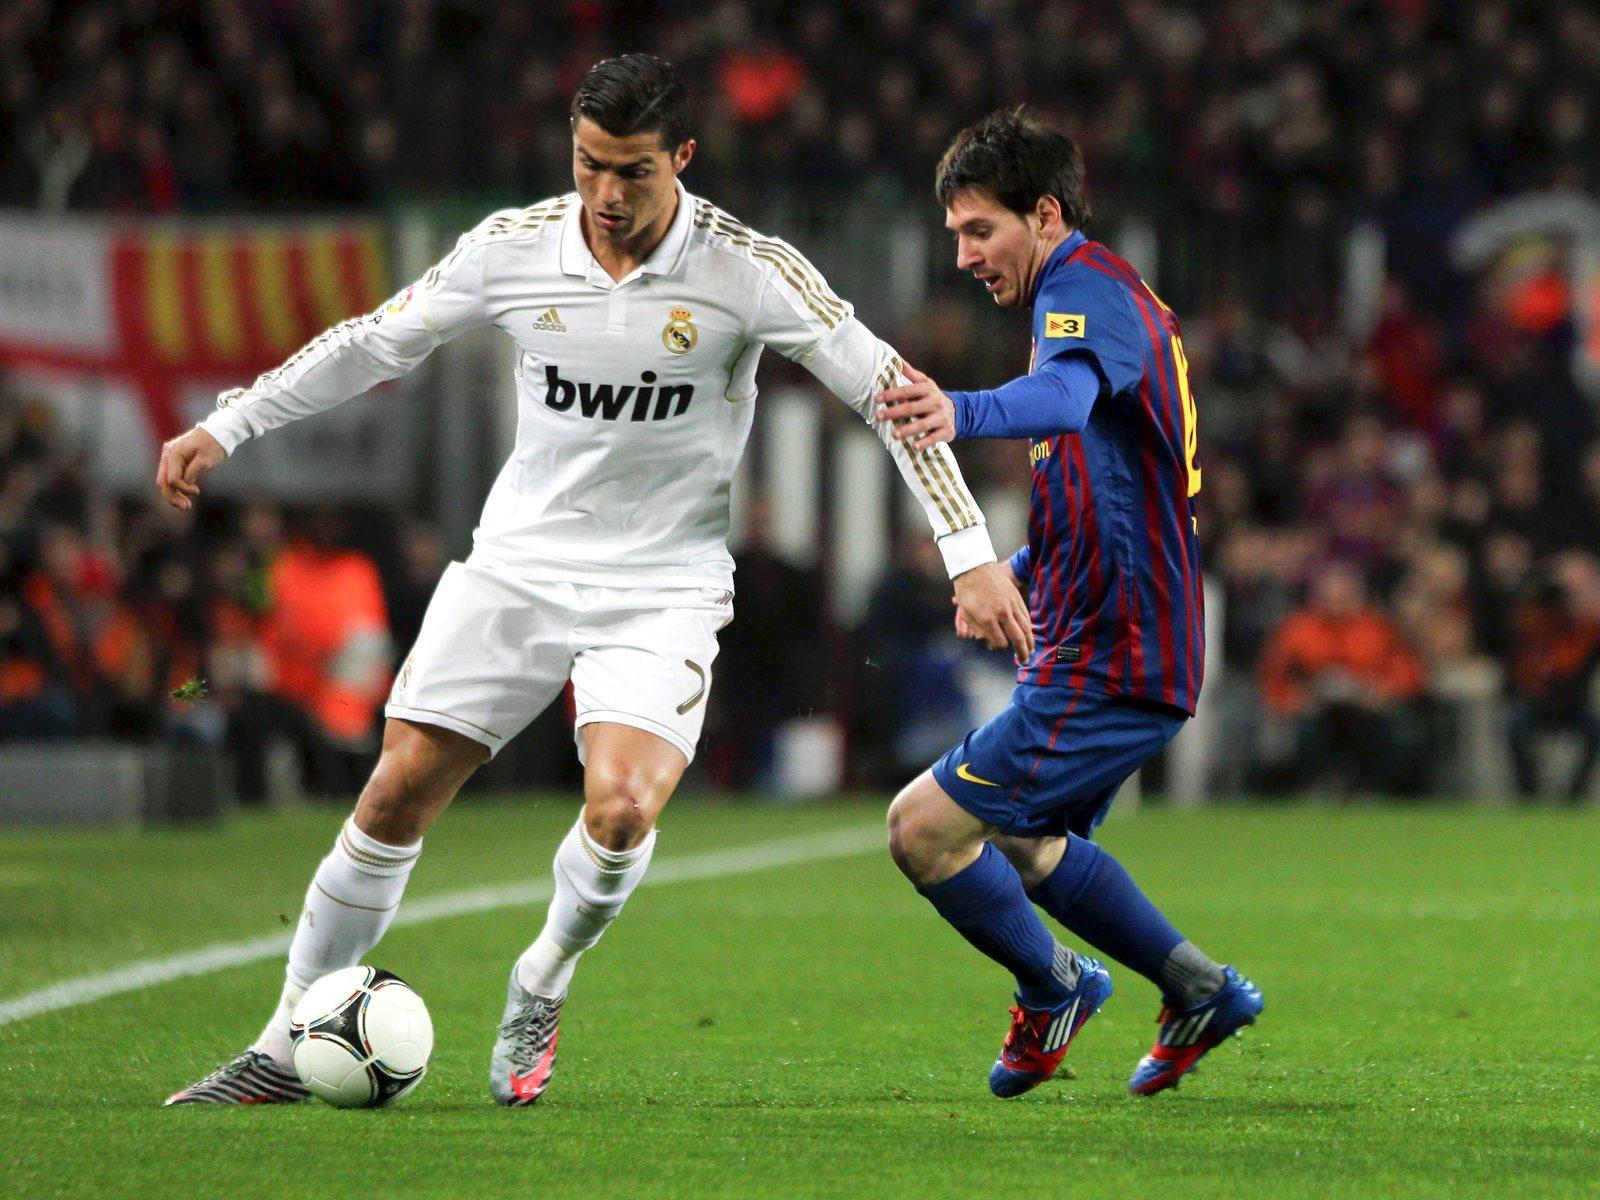 b7dc9c179767 Can Cristiano Ronaldo break Lionel Messi's goalscoring records this season?